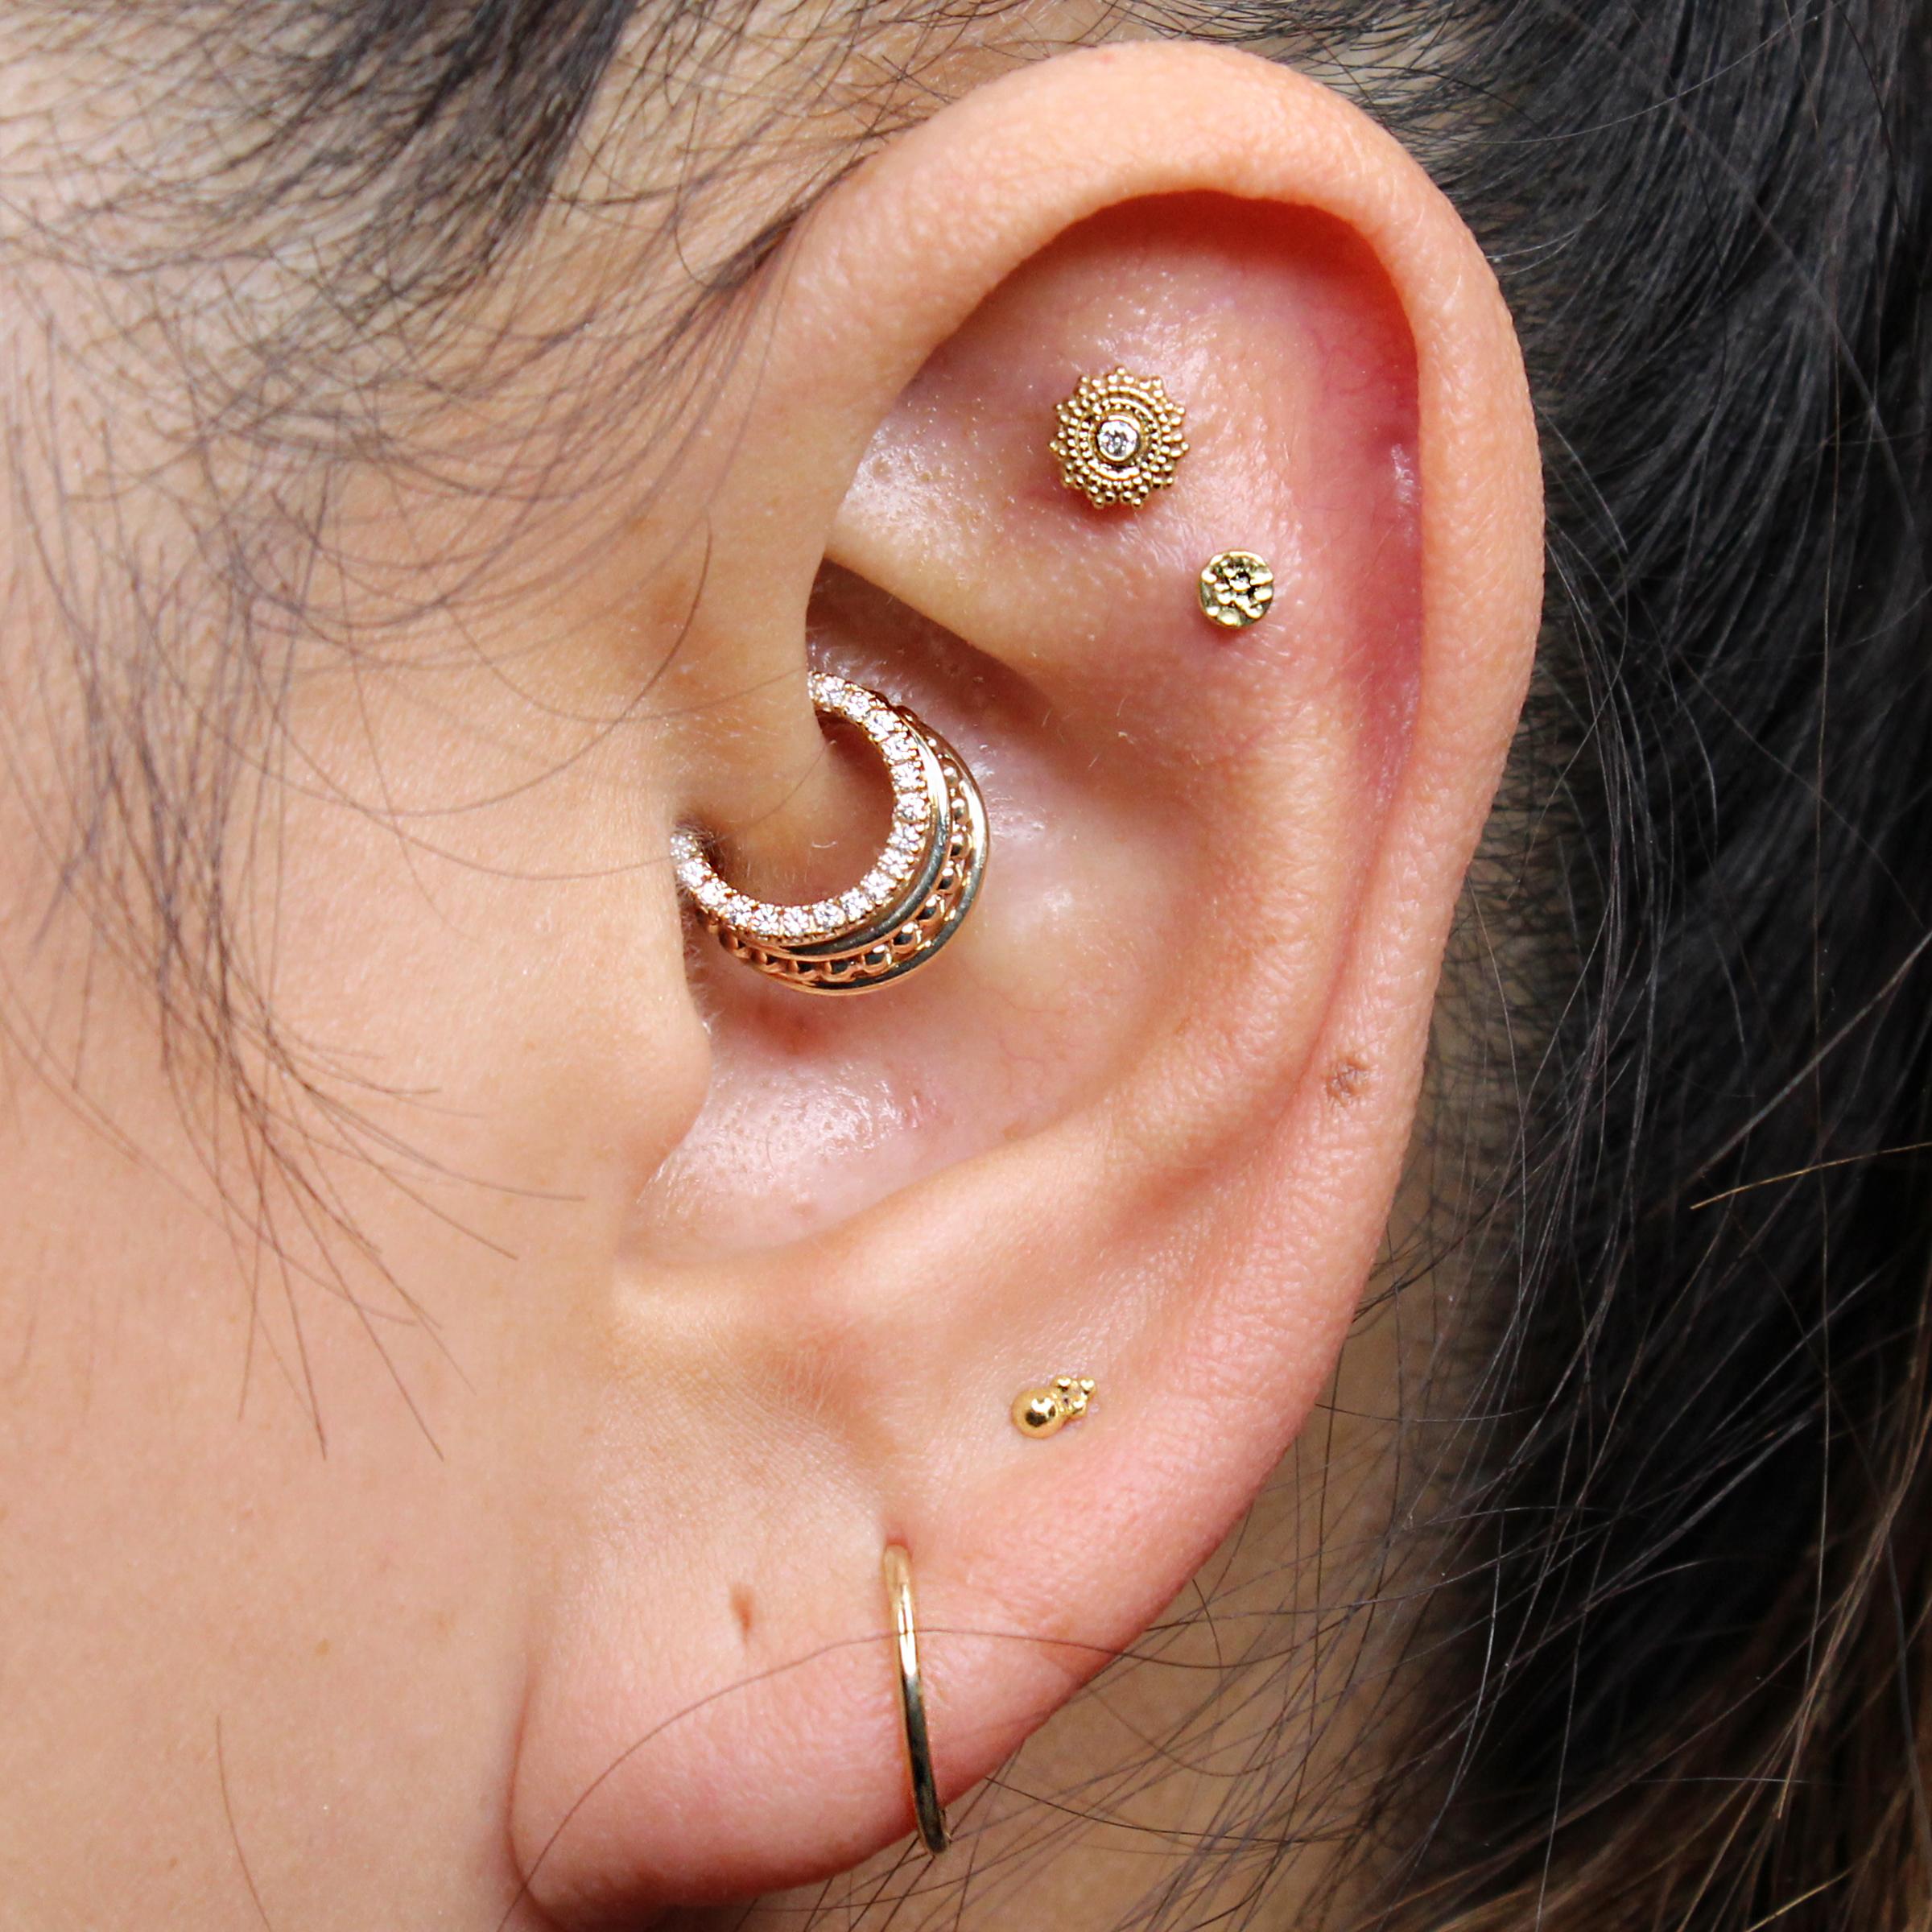 Piercing IMG_2592 Molly Ear BVLA Daith.jpg